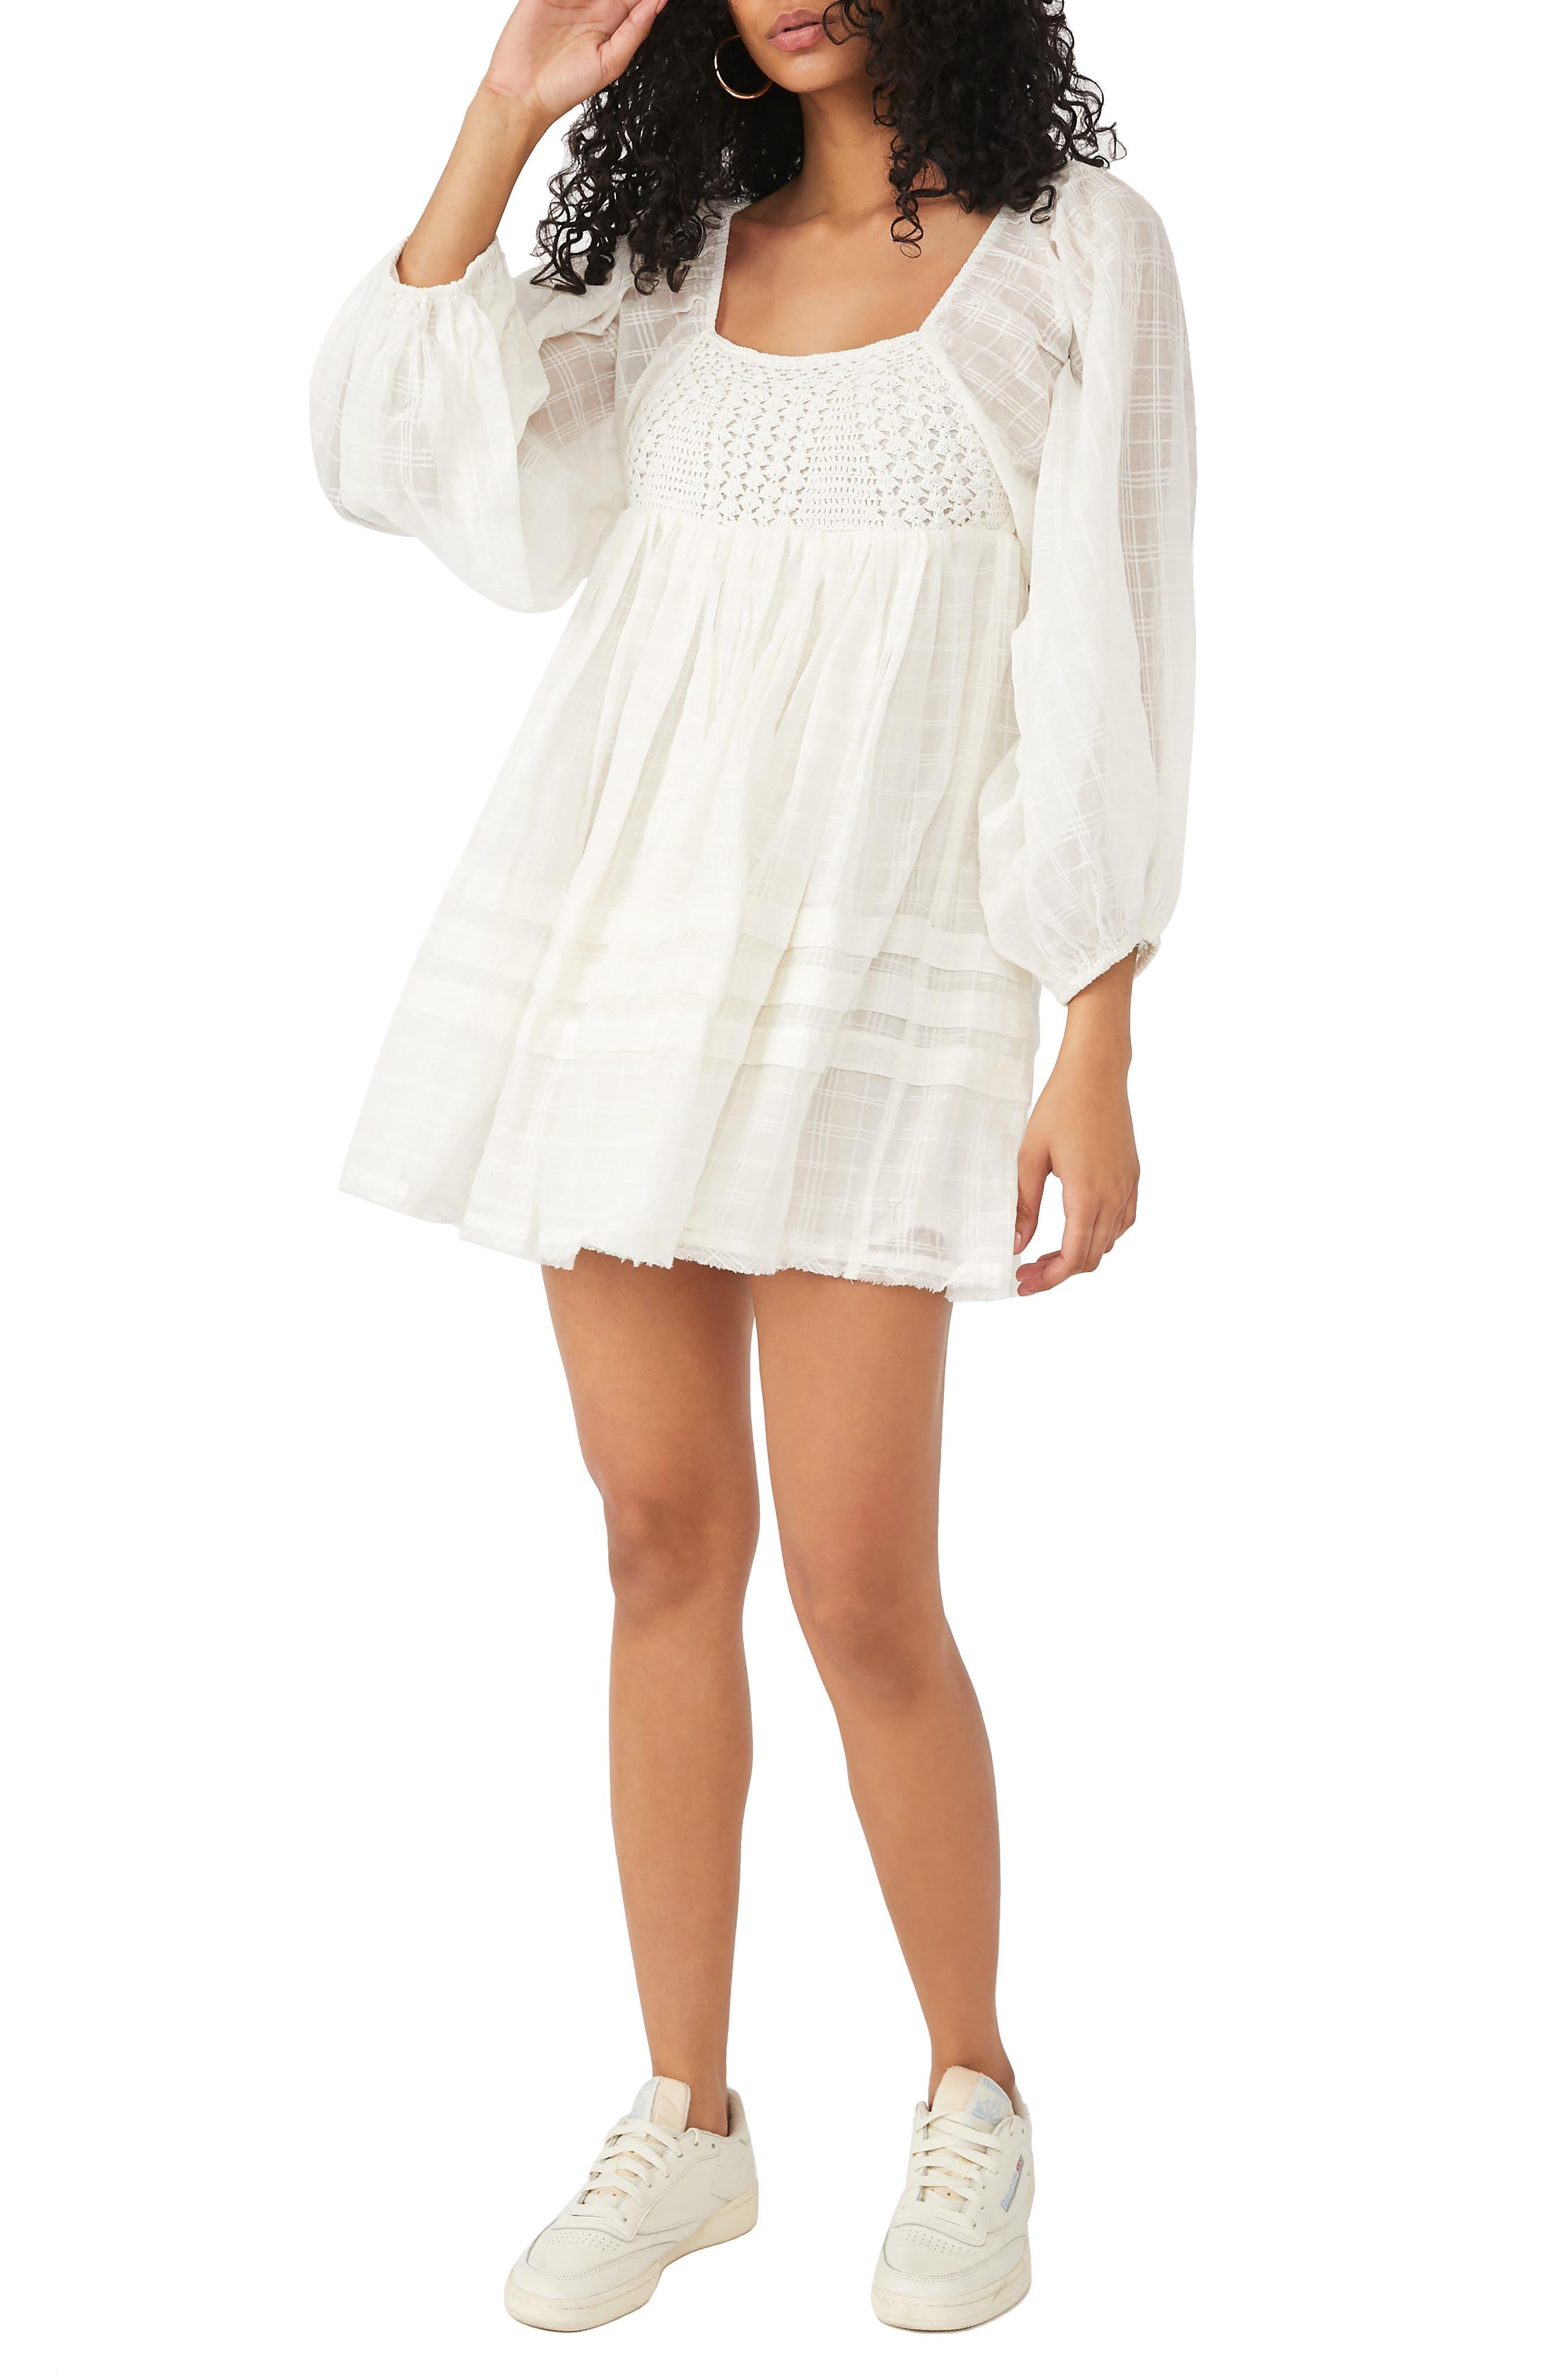 Ari Long Sleeve Minidress